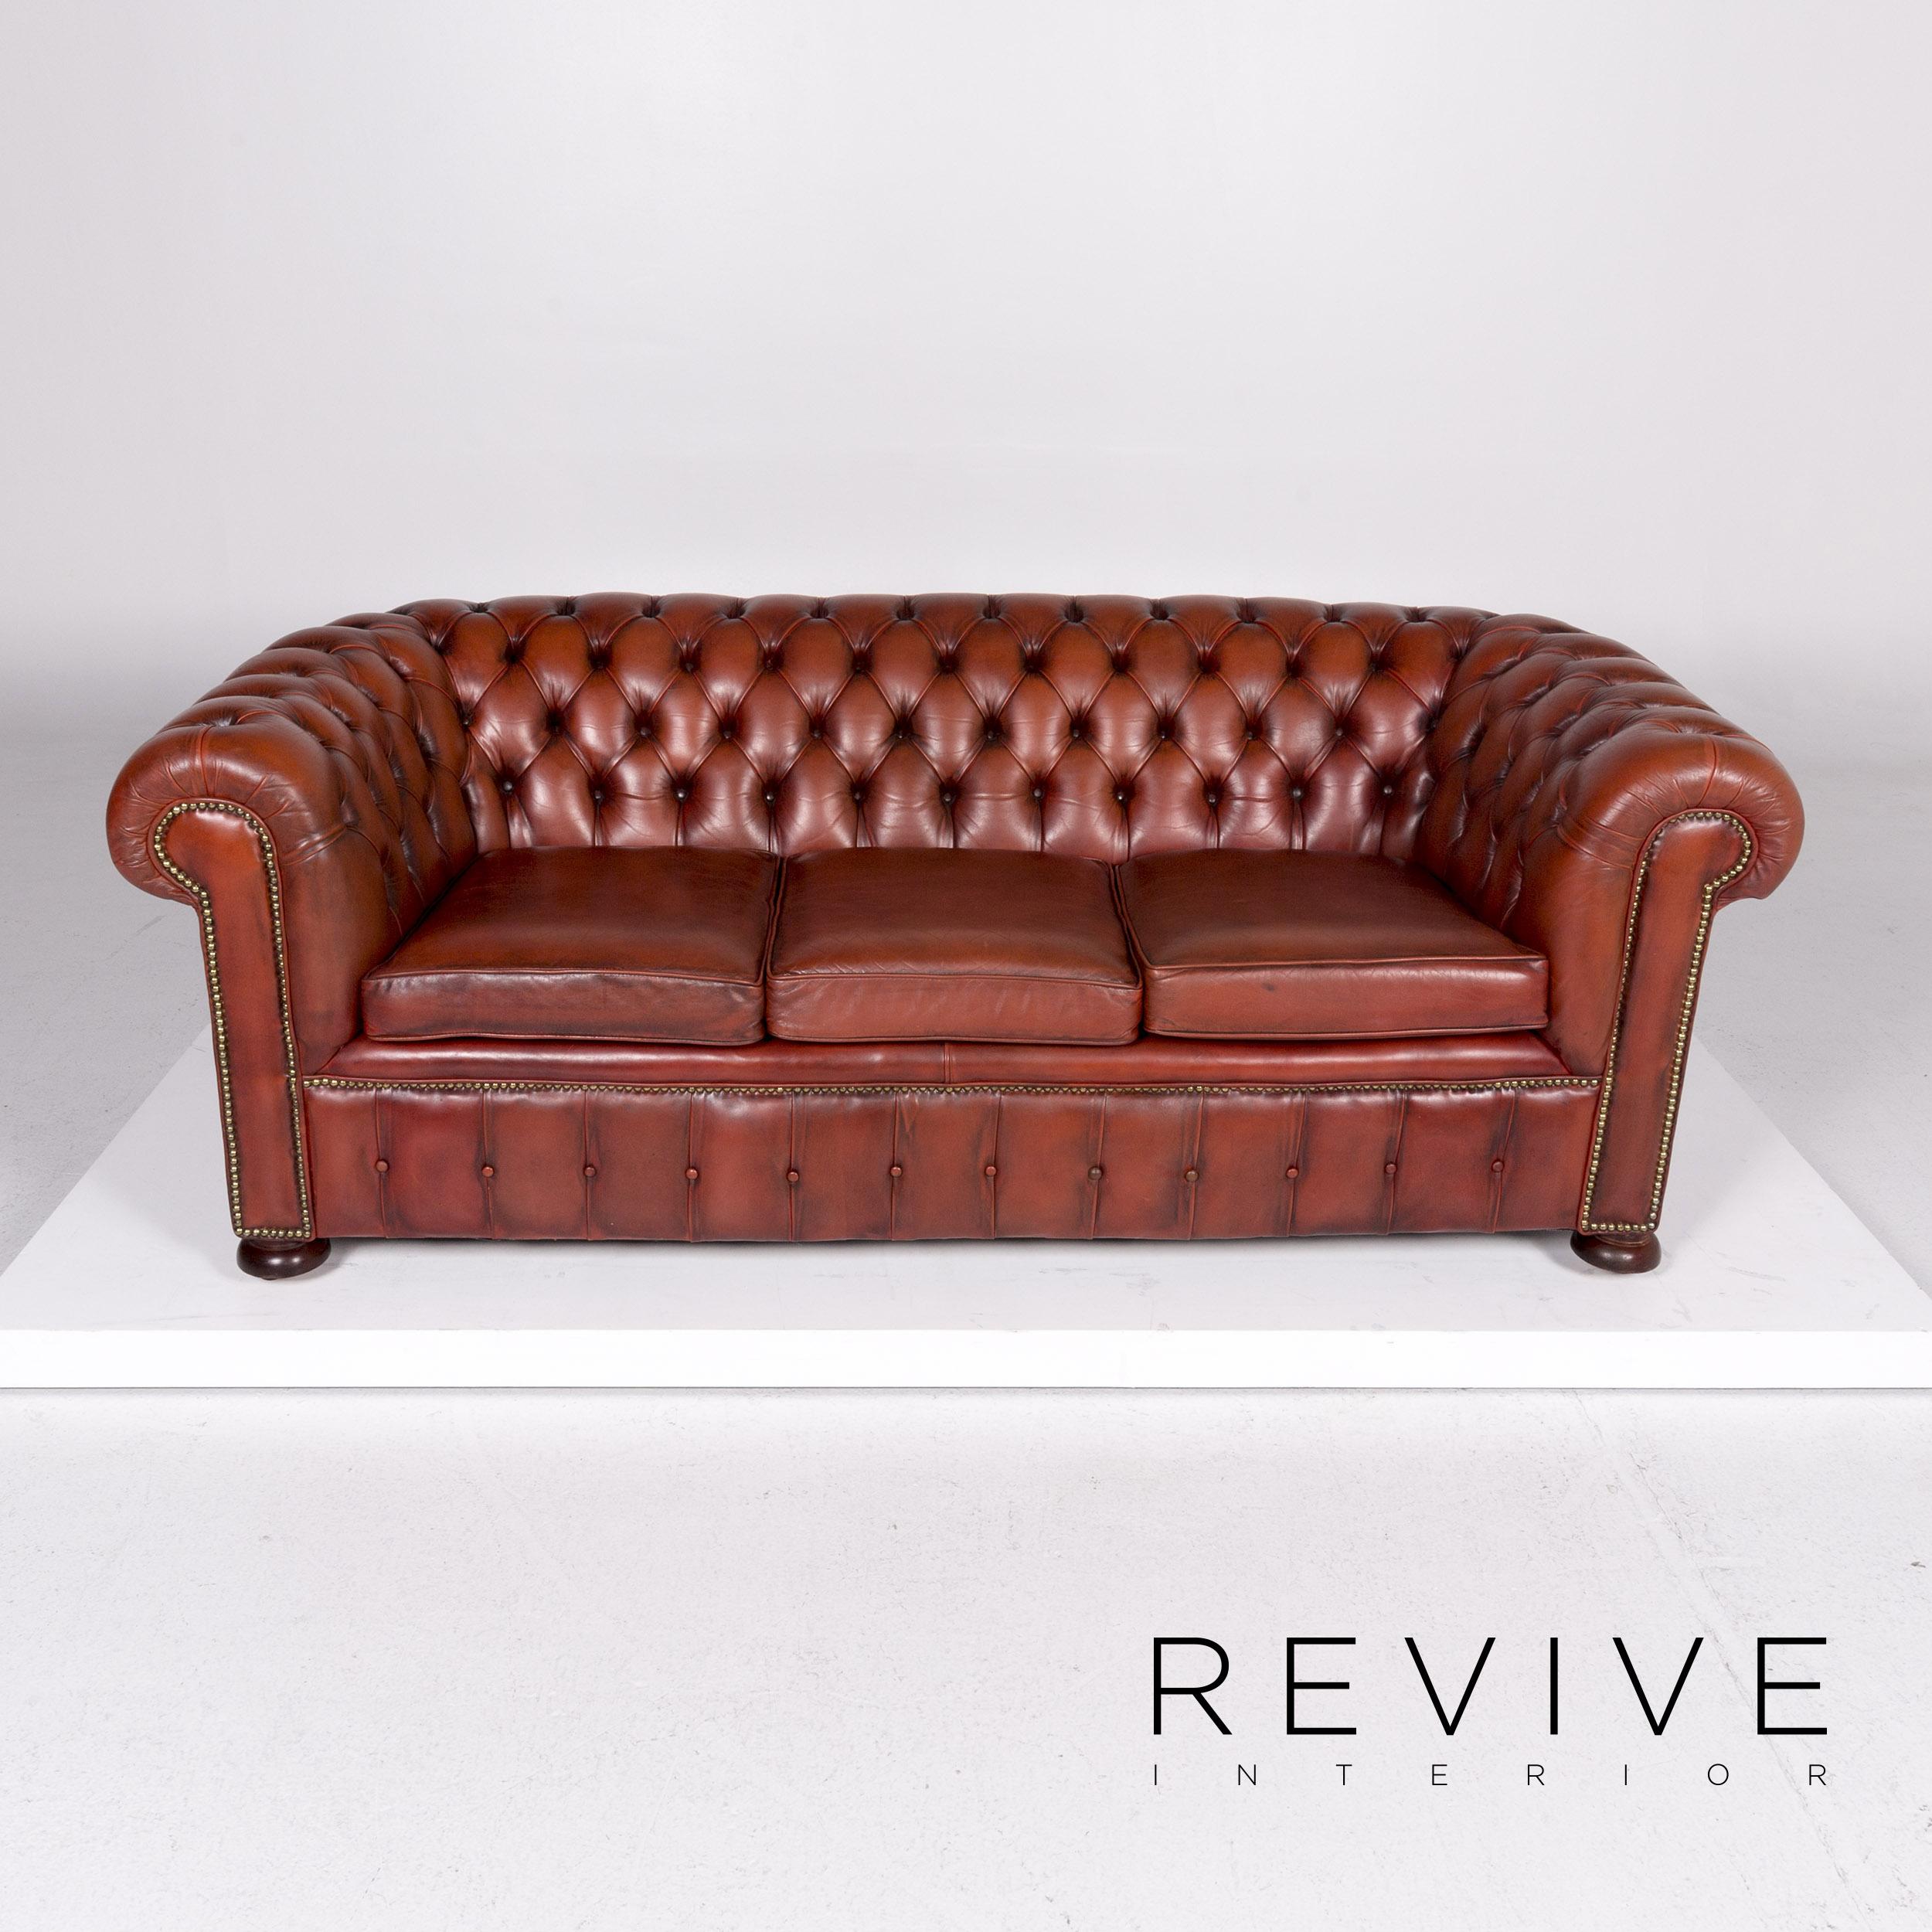 Full Size of Sofa Leder Braun 3 2 1 Otto Rustikal Ledersofa Design Kaufen Gebraucht Chesterfield Couch Vintage Ikea 3 Sitzer   Set 2 Sitzer Kupfer Rotbraun Dreisitzer Retro Sofa Sofa Leder Braun